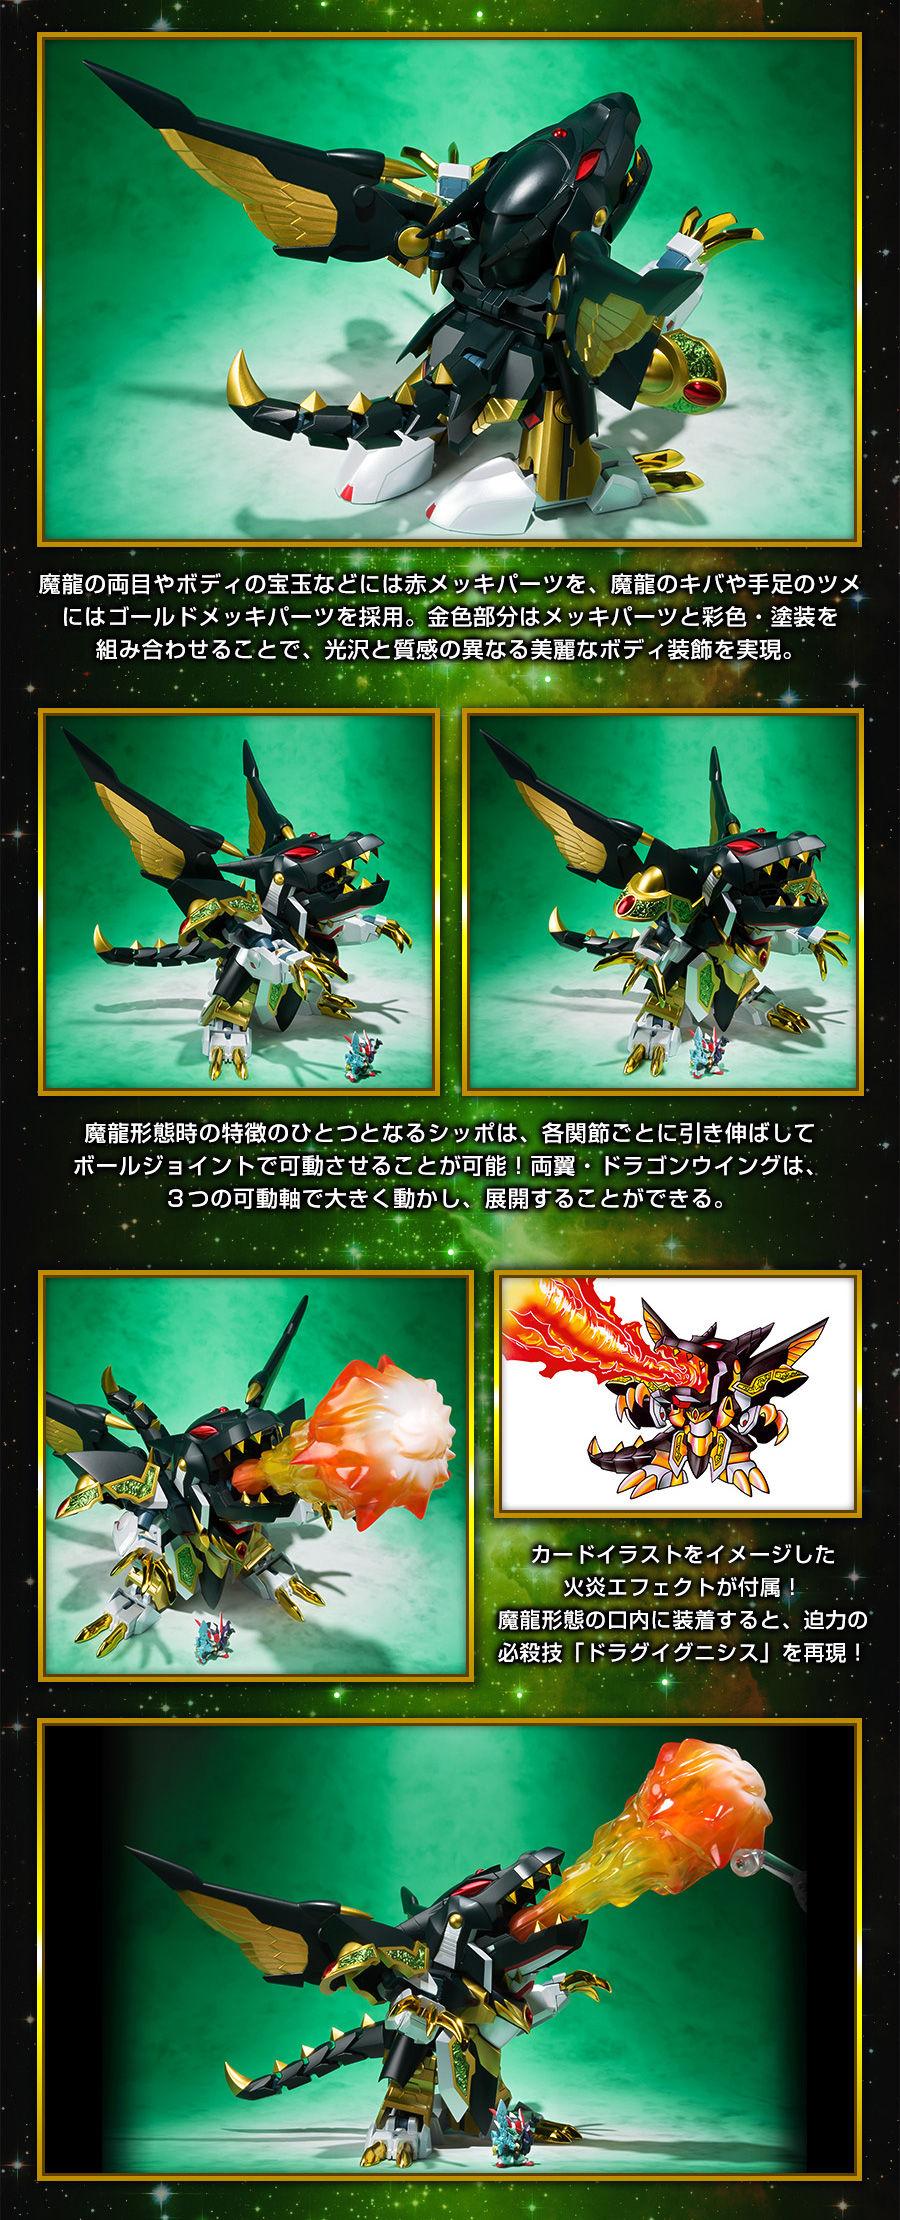 SDX Gundam (Bandai) I3t9uI7u_o